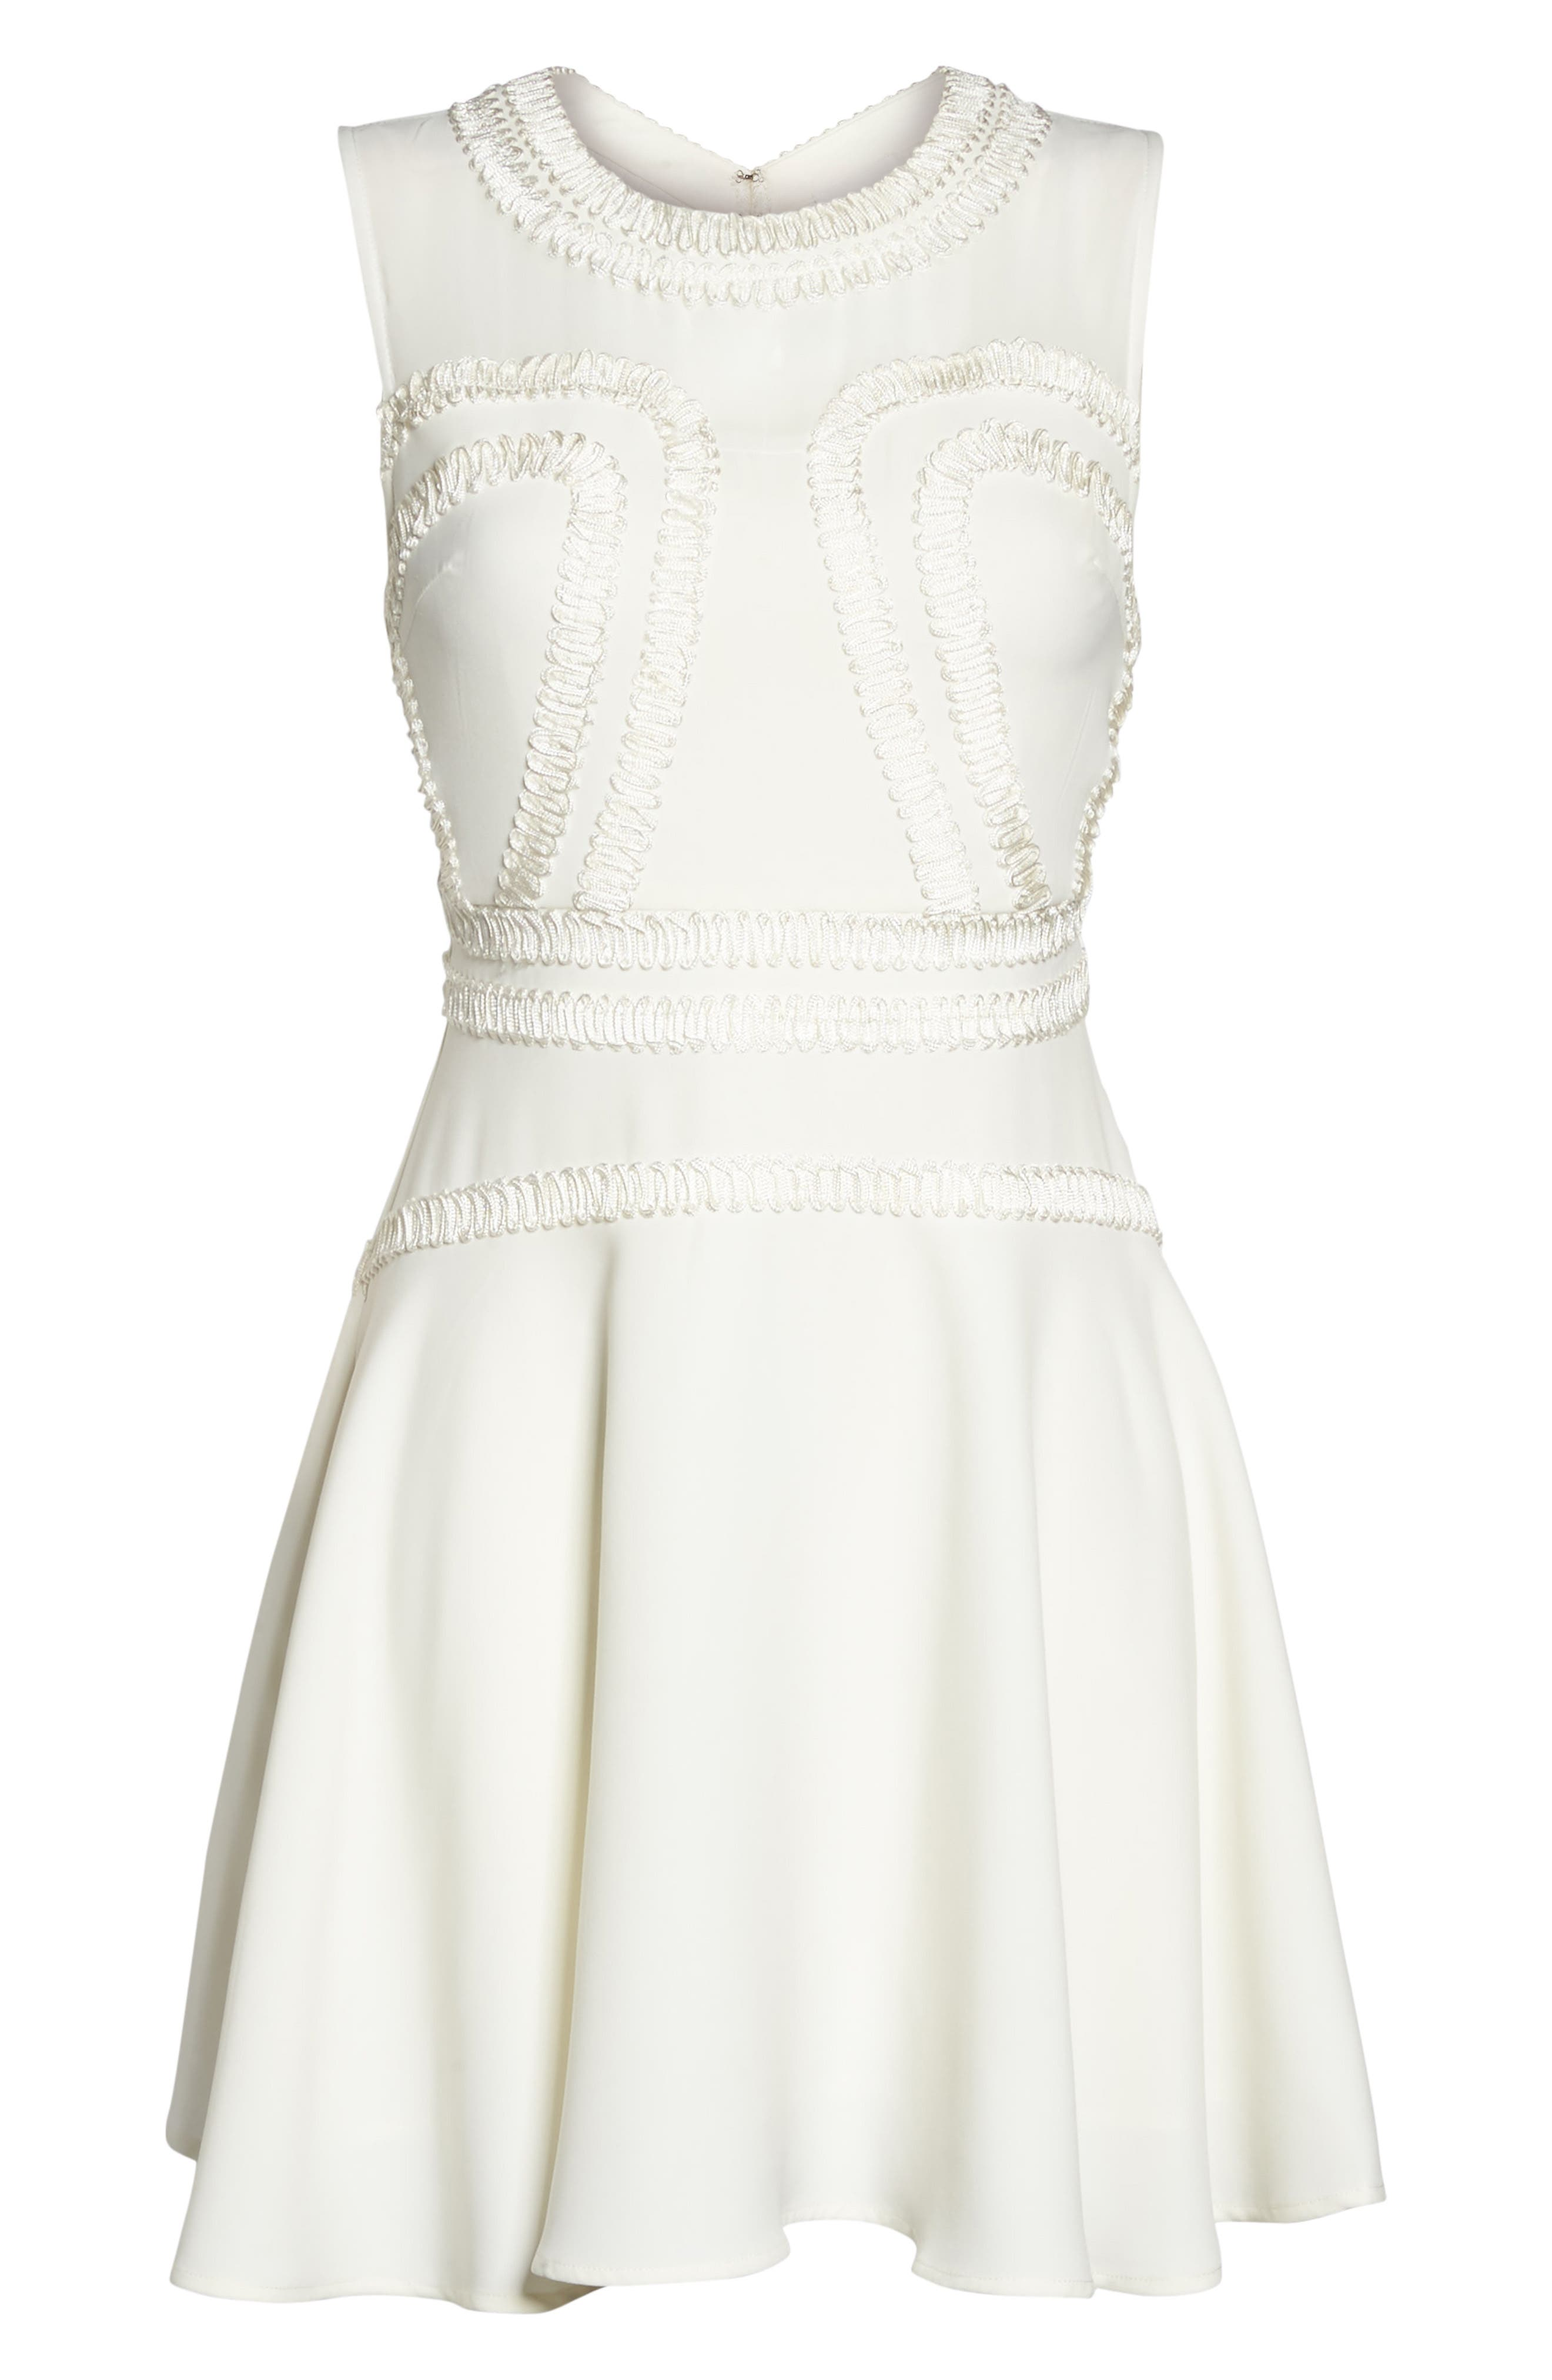 Aviana Fit & Flare Dress,                             Alternate thumbnail 6, color,                             902